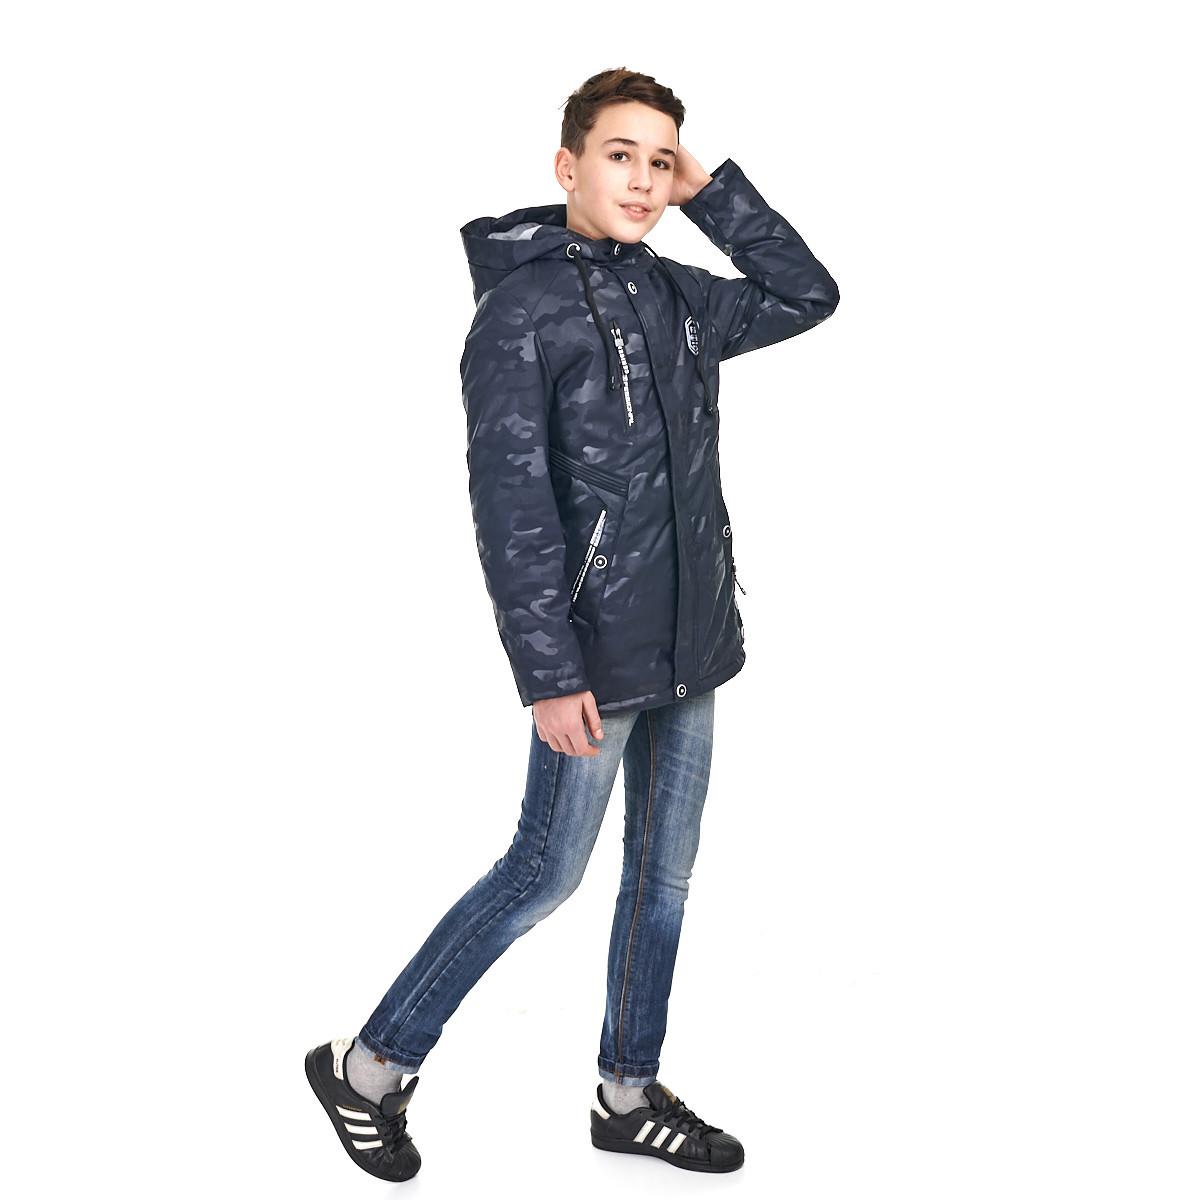 Осенняя курточка на мальчика  10-15 лет, размеры 140-164